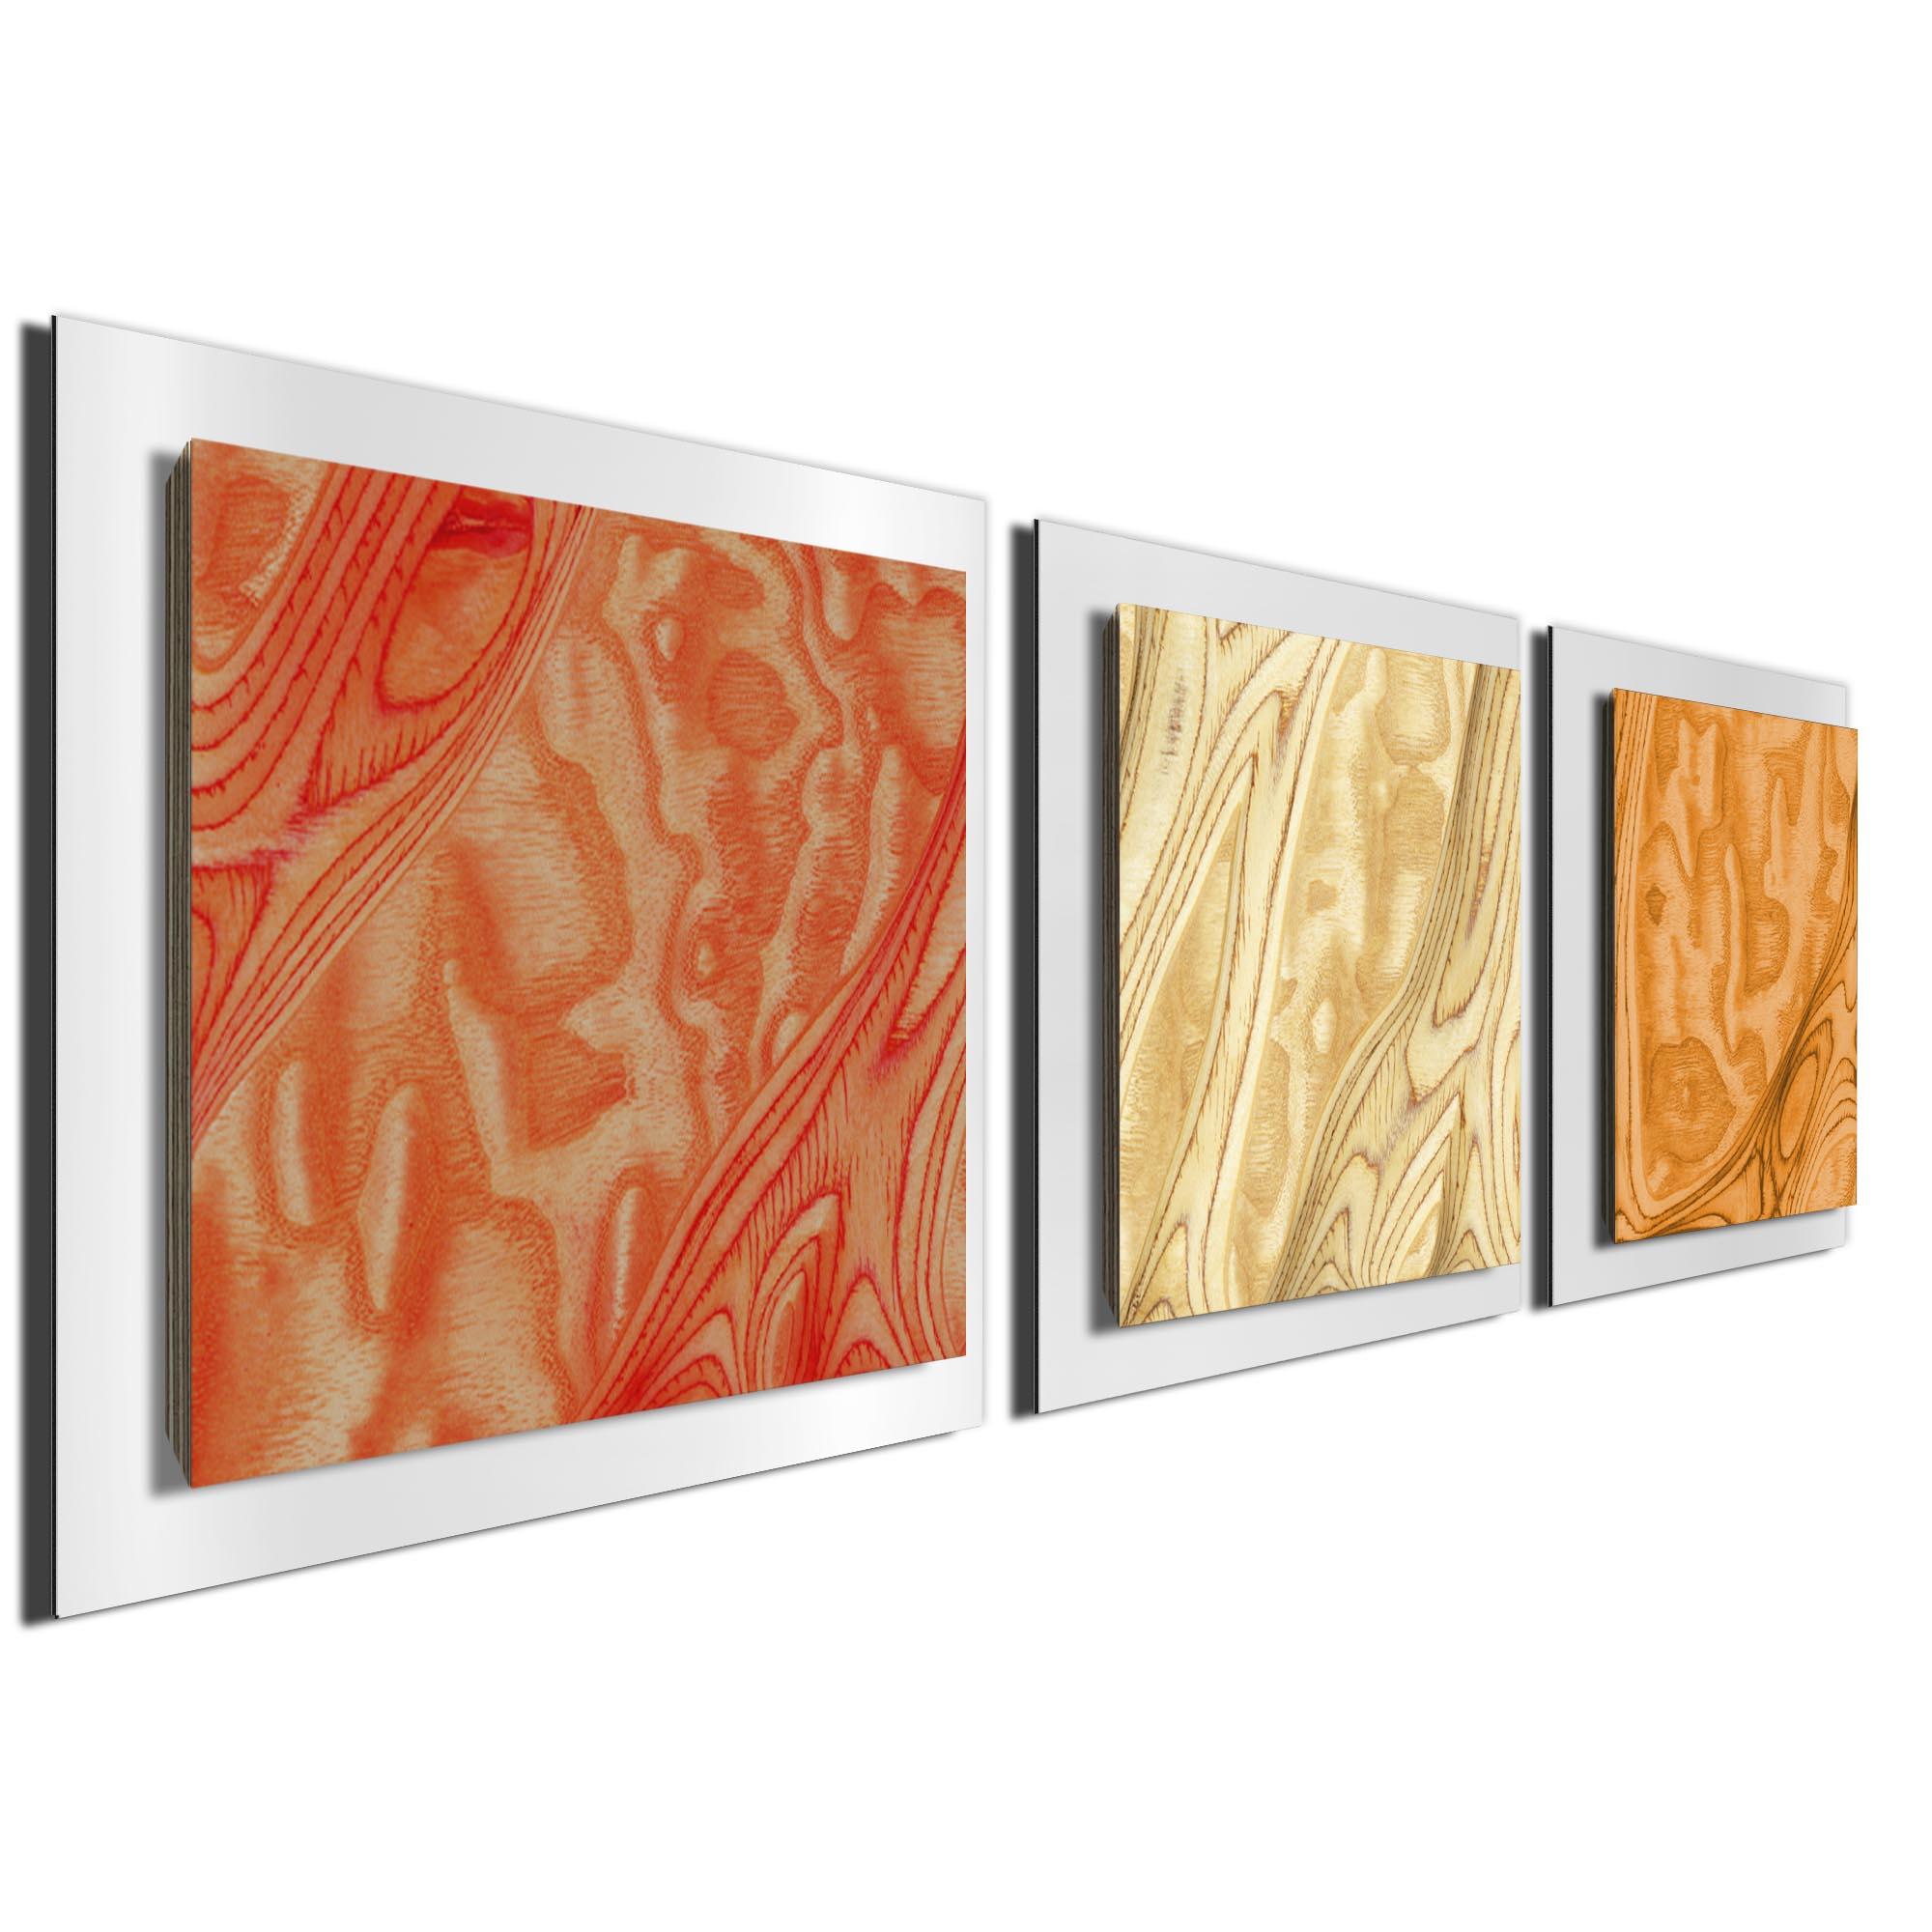 Autumn Burl Essence White by Jackson Wright Rustic Modern Style Wood Wall Art - Image 2